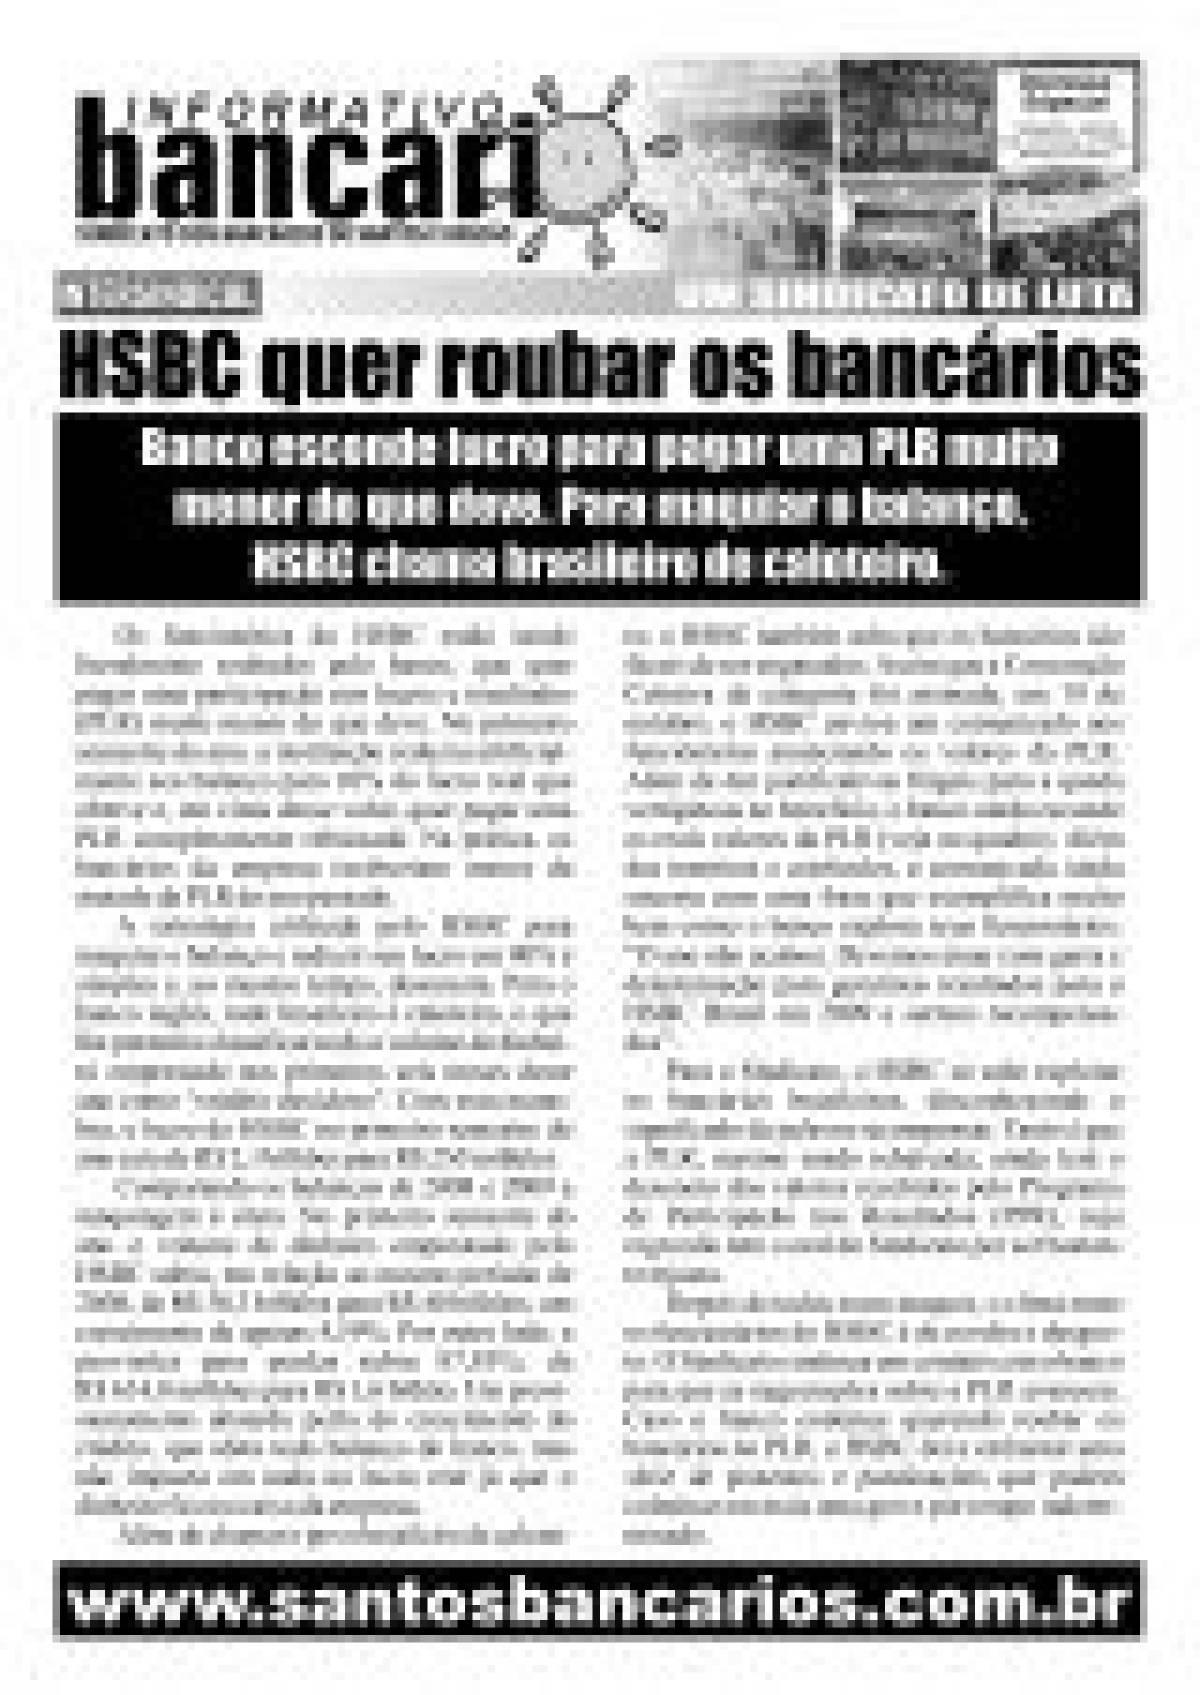 HSBC quer roubar bancários